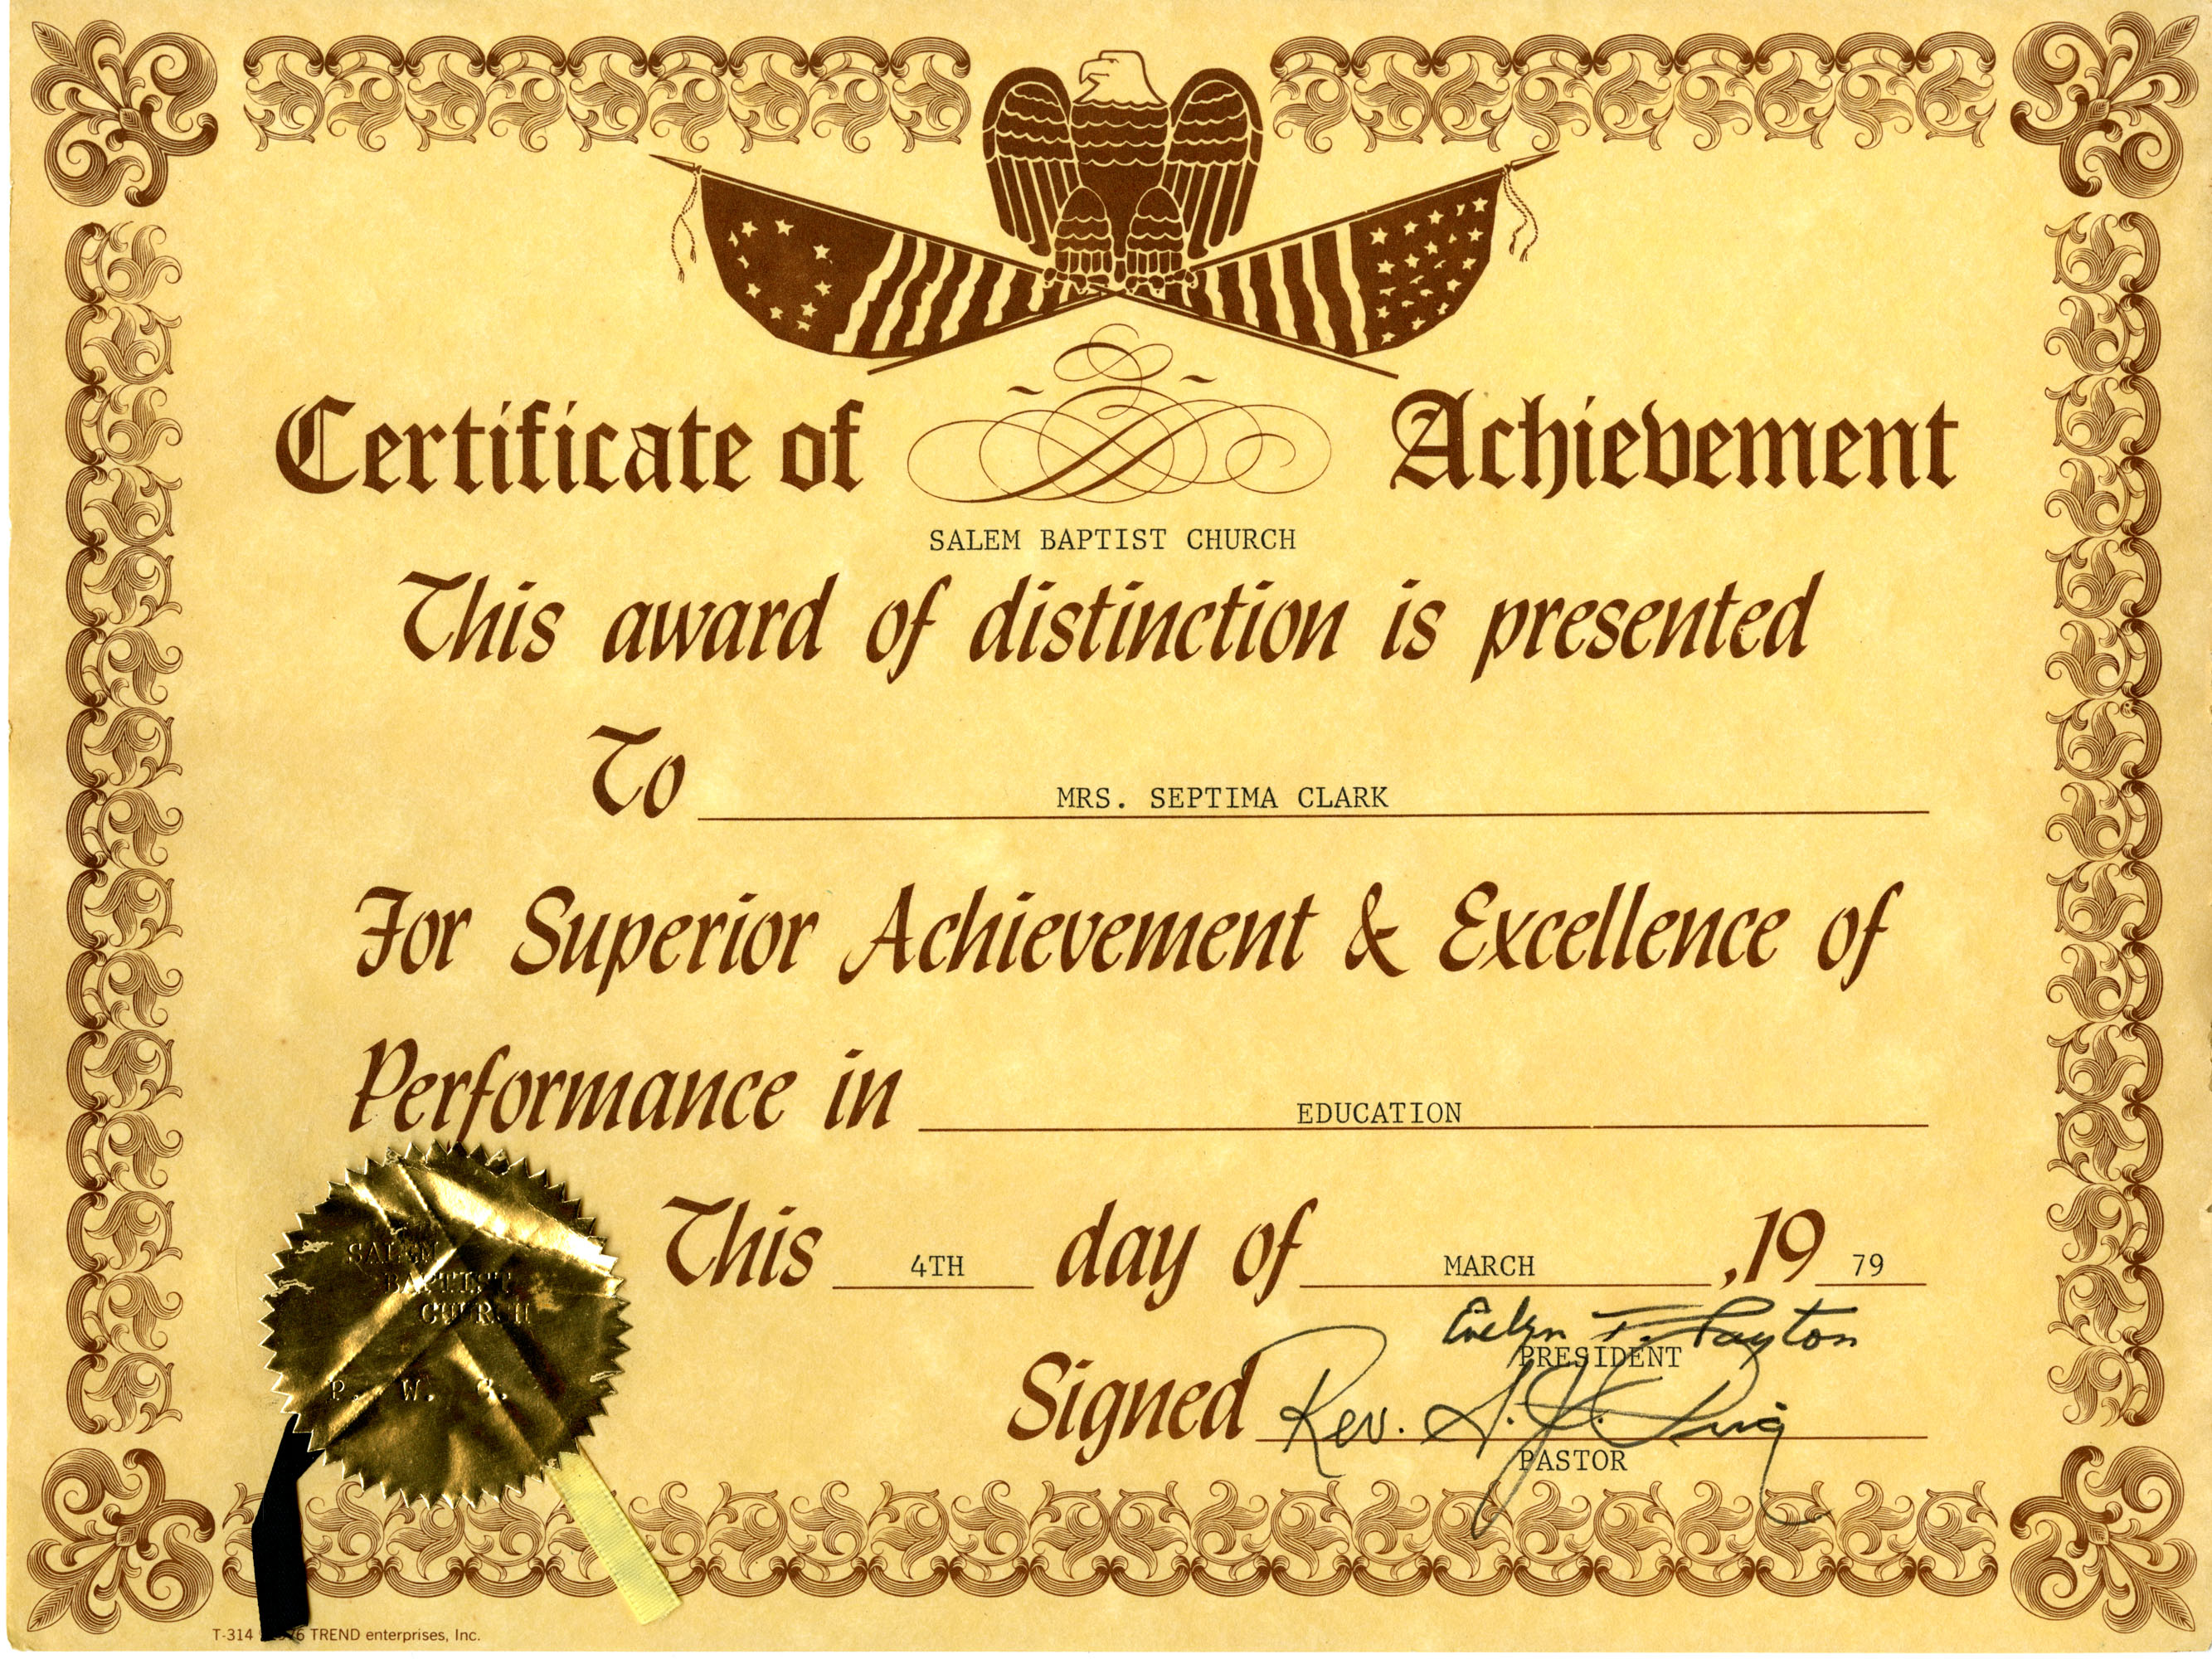 Certificate, March 4, 1979